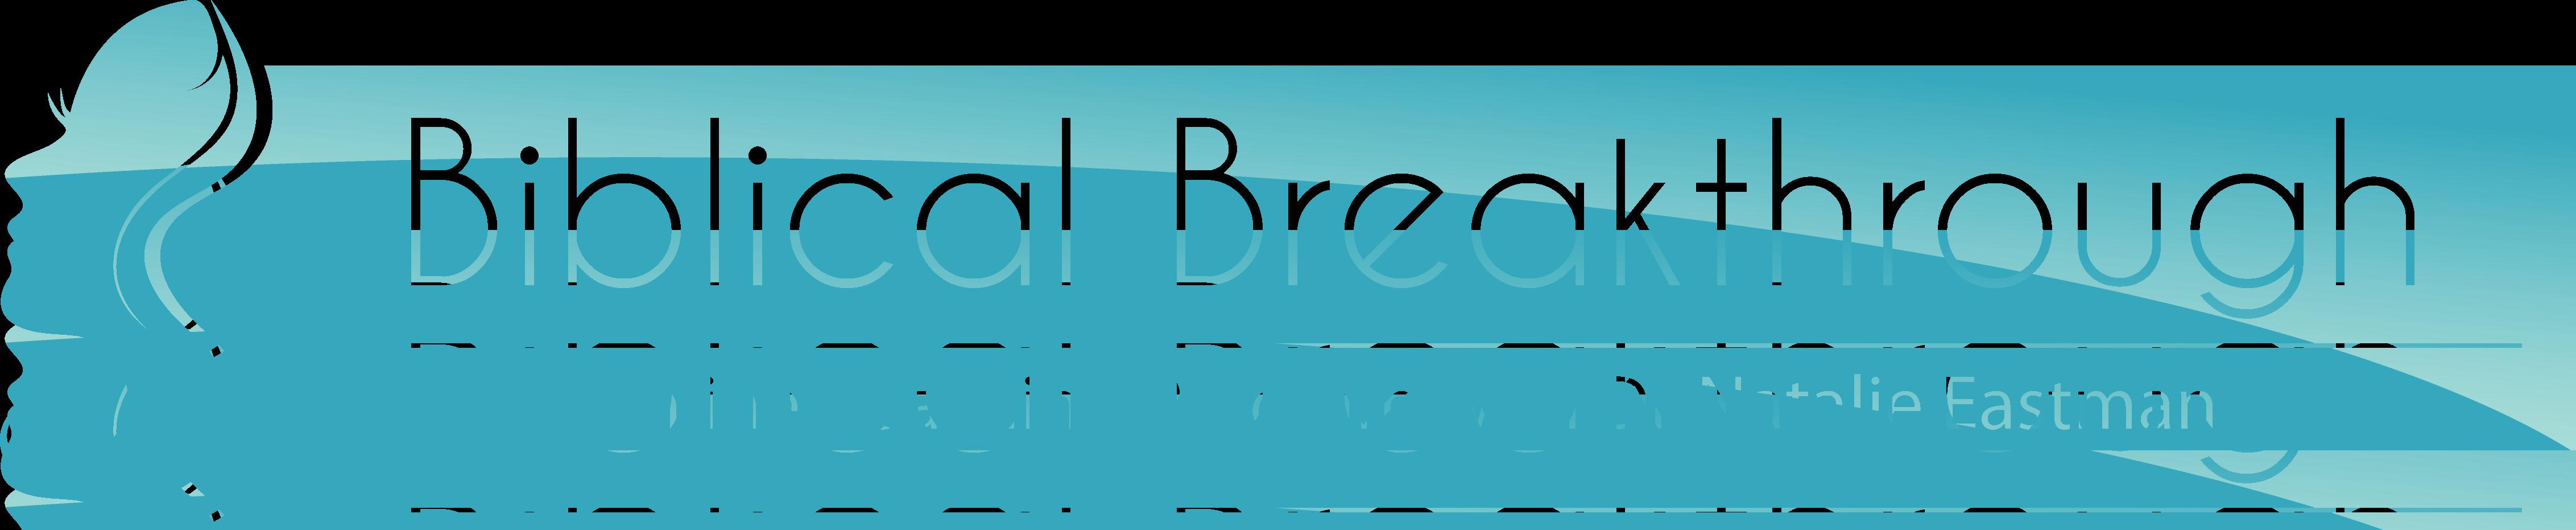 Biblical Breakthrough Logo BB_logo_alt3_rev